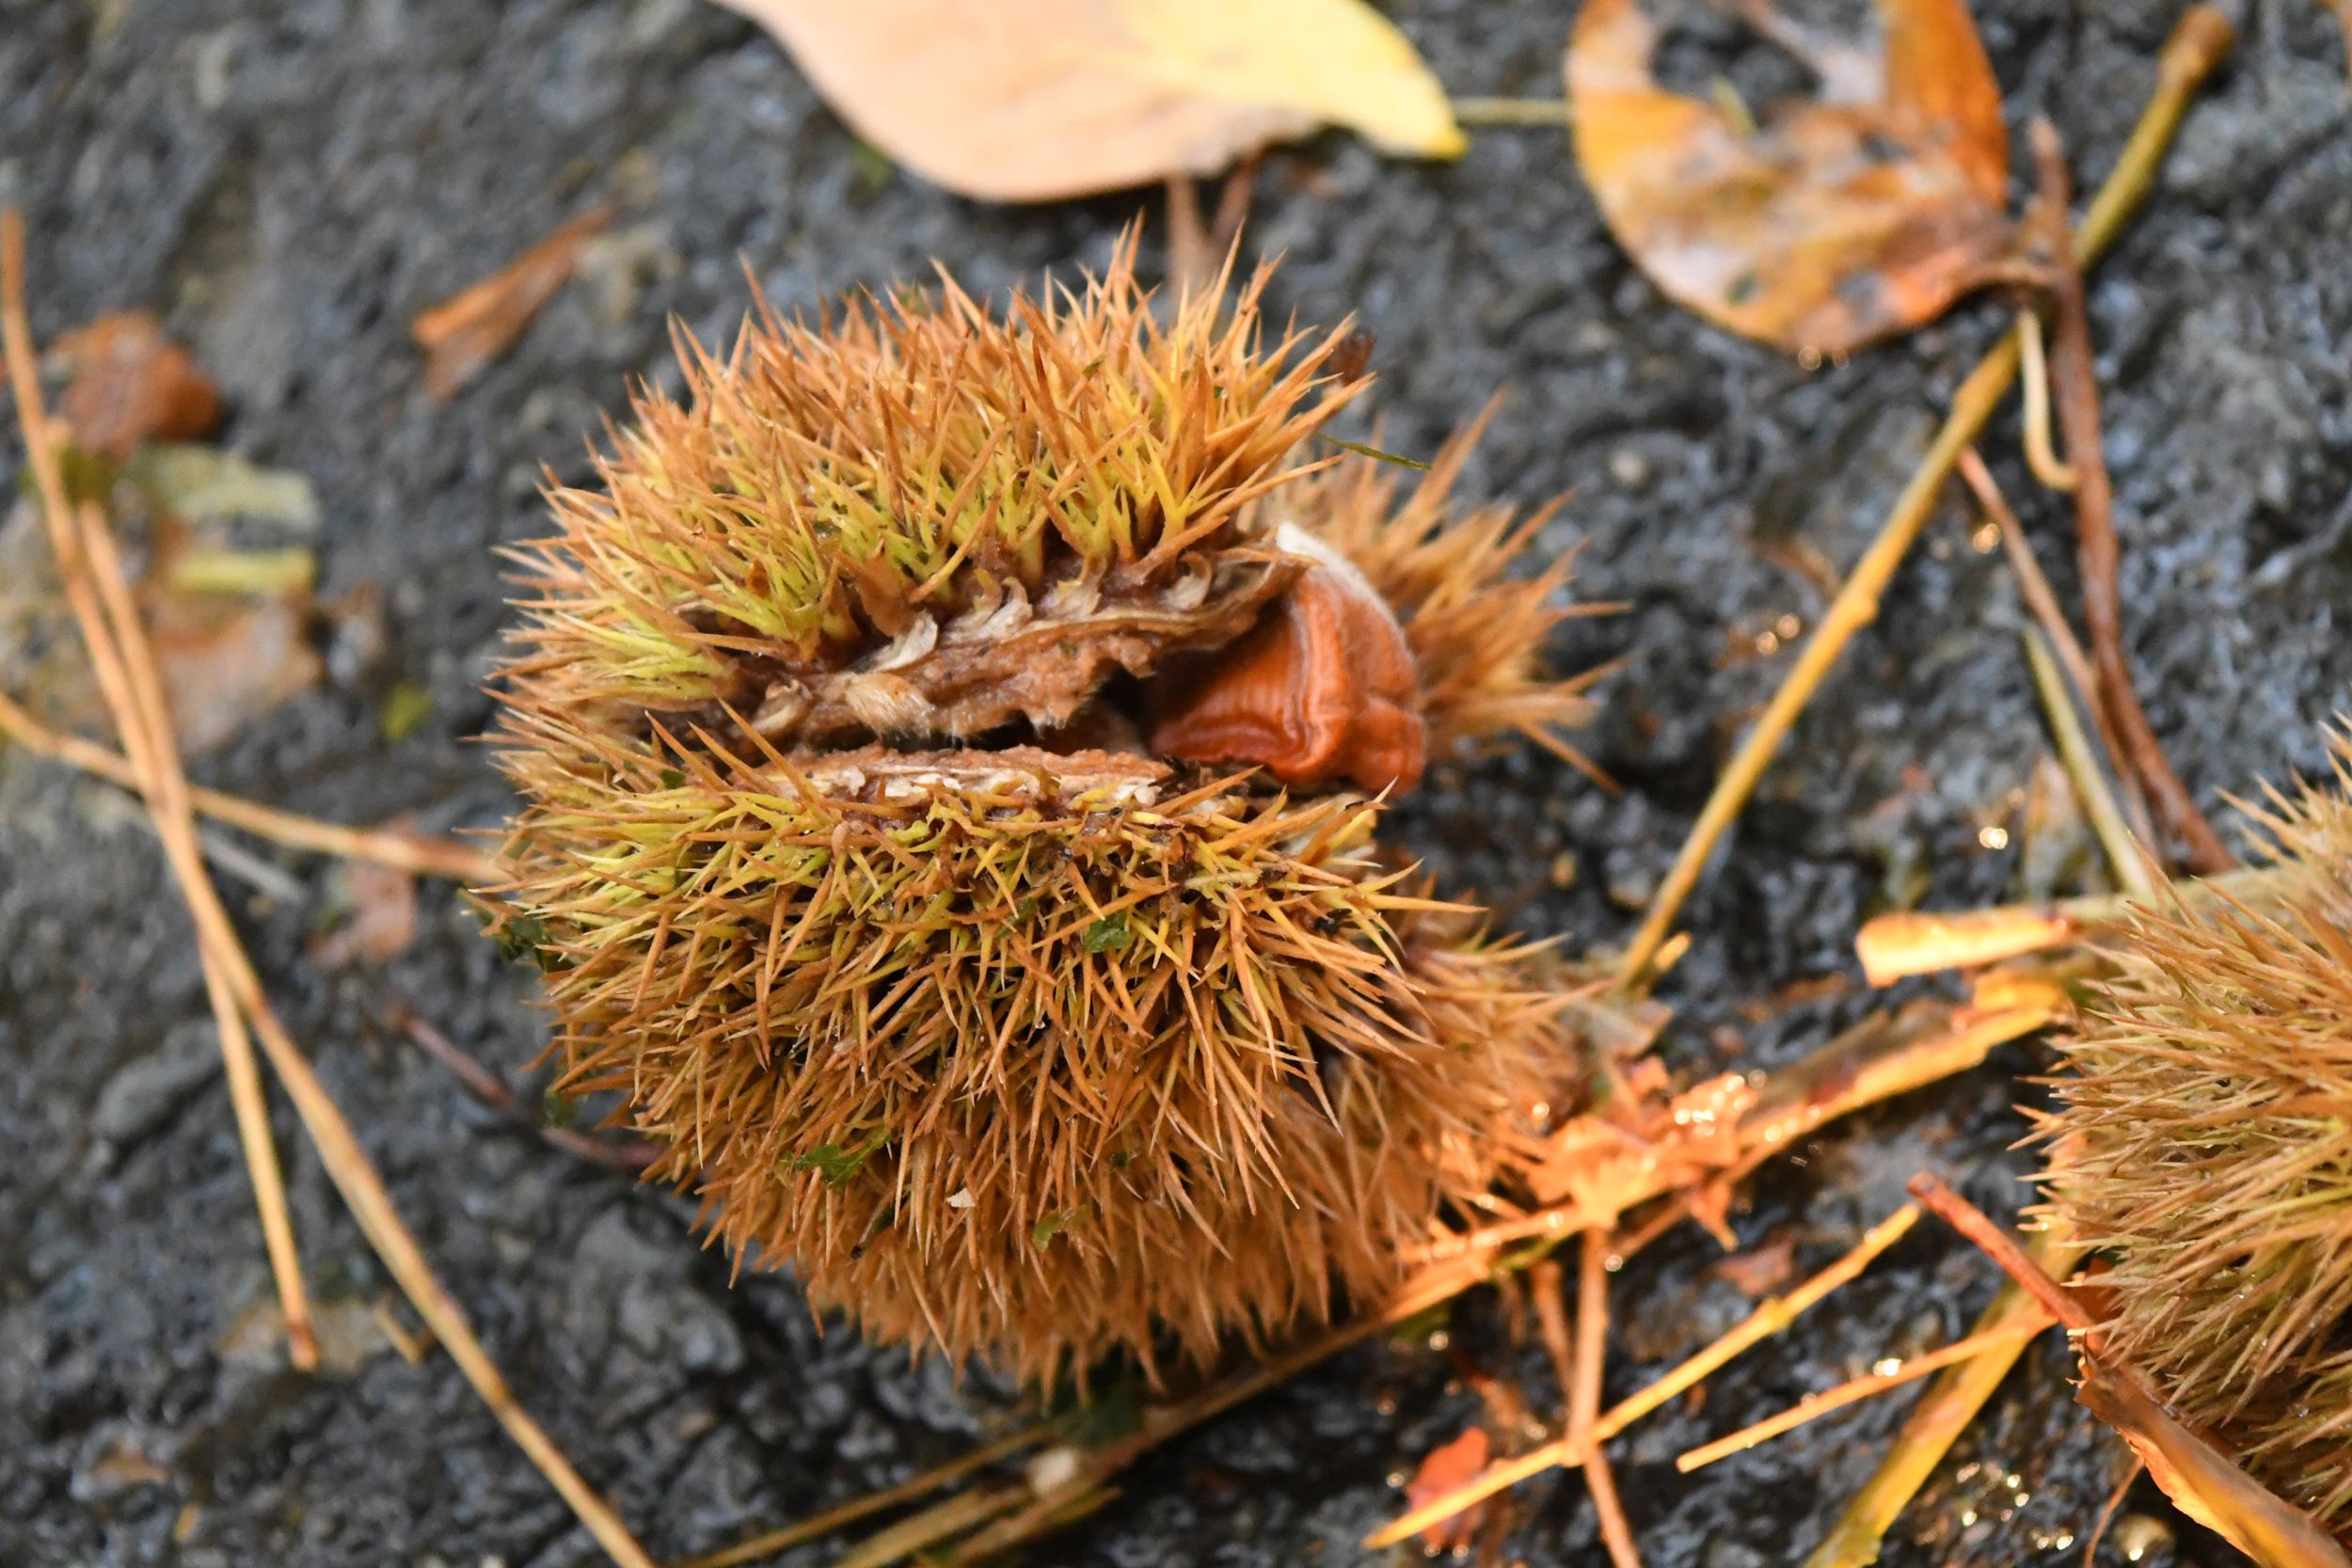 American chestnut pod, Prospect Park